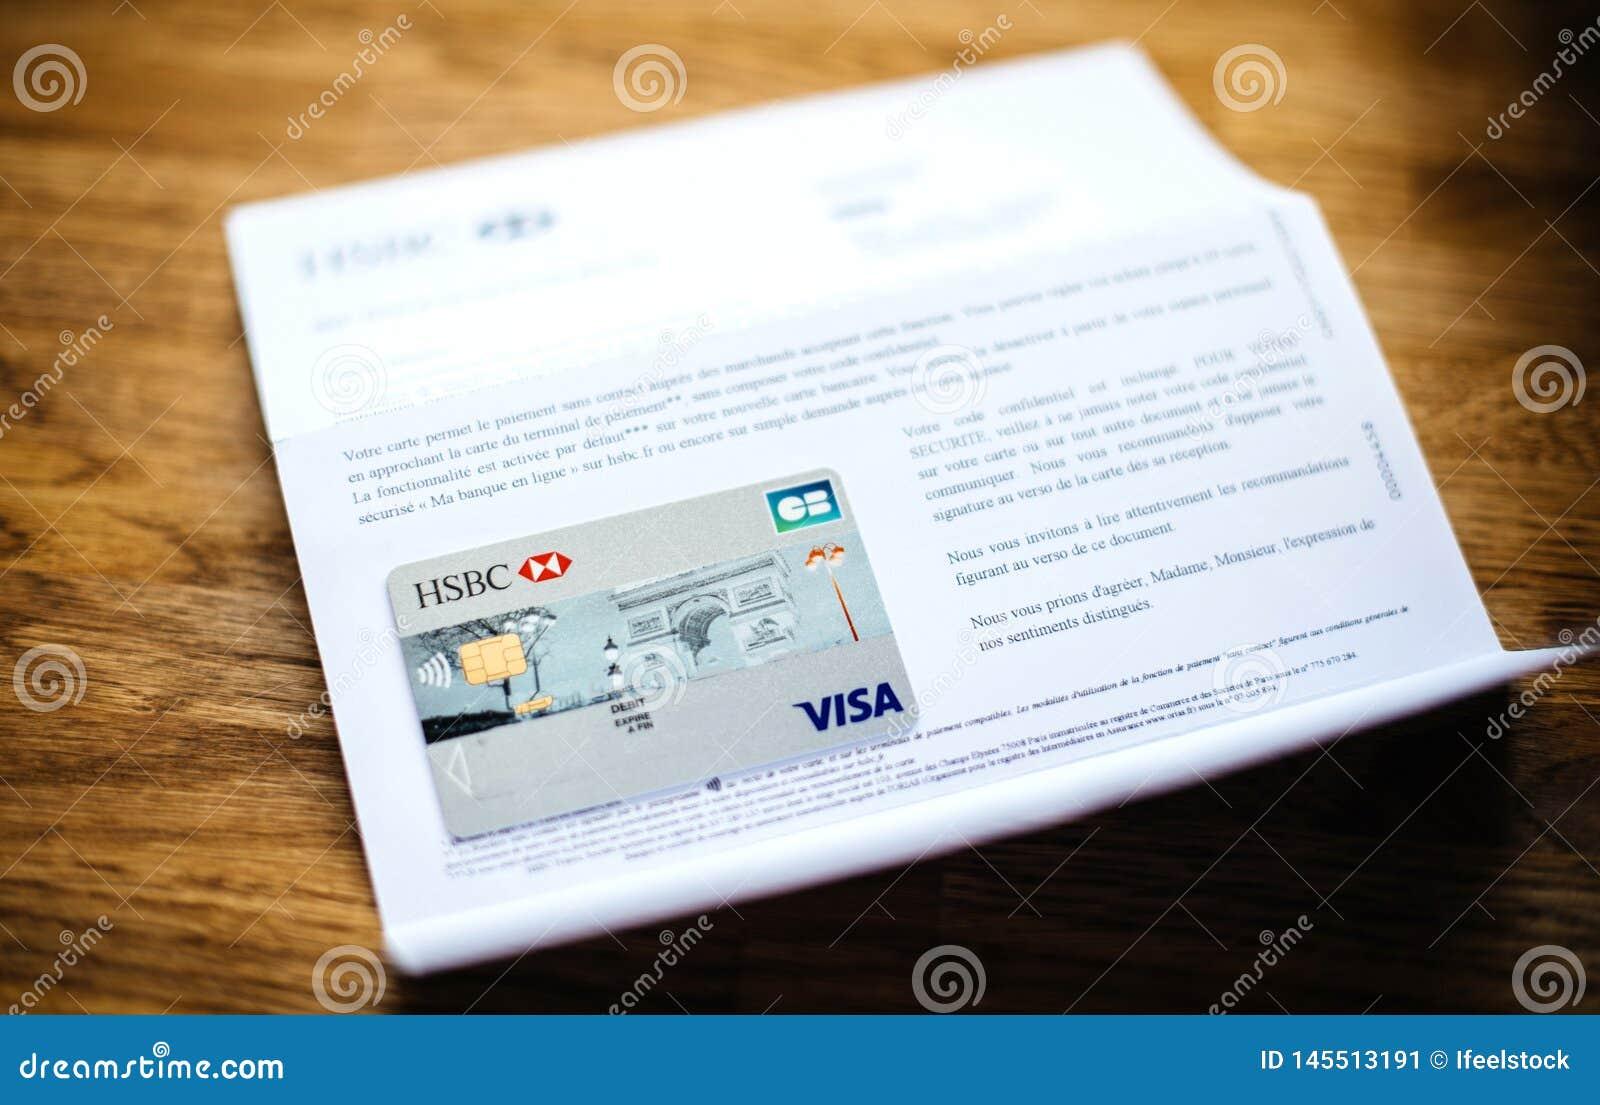 New Hsbc Visa Debit Card Editorial Photo Image Of Commerce 145513191